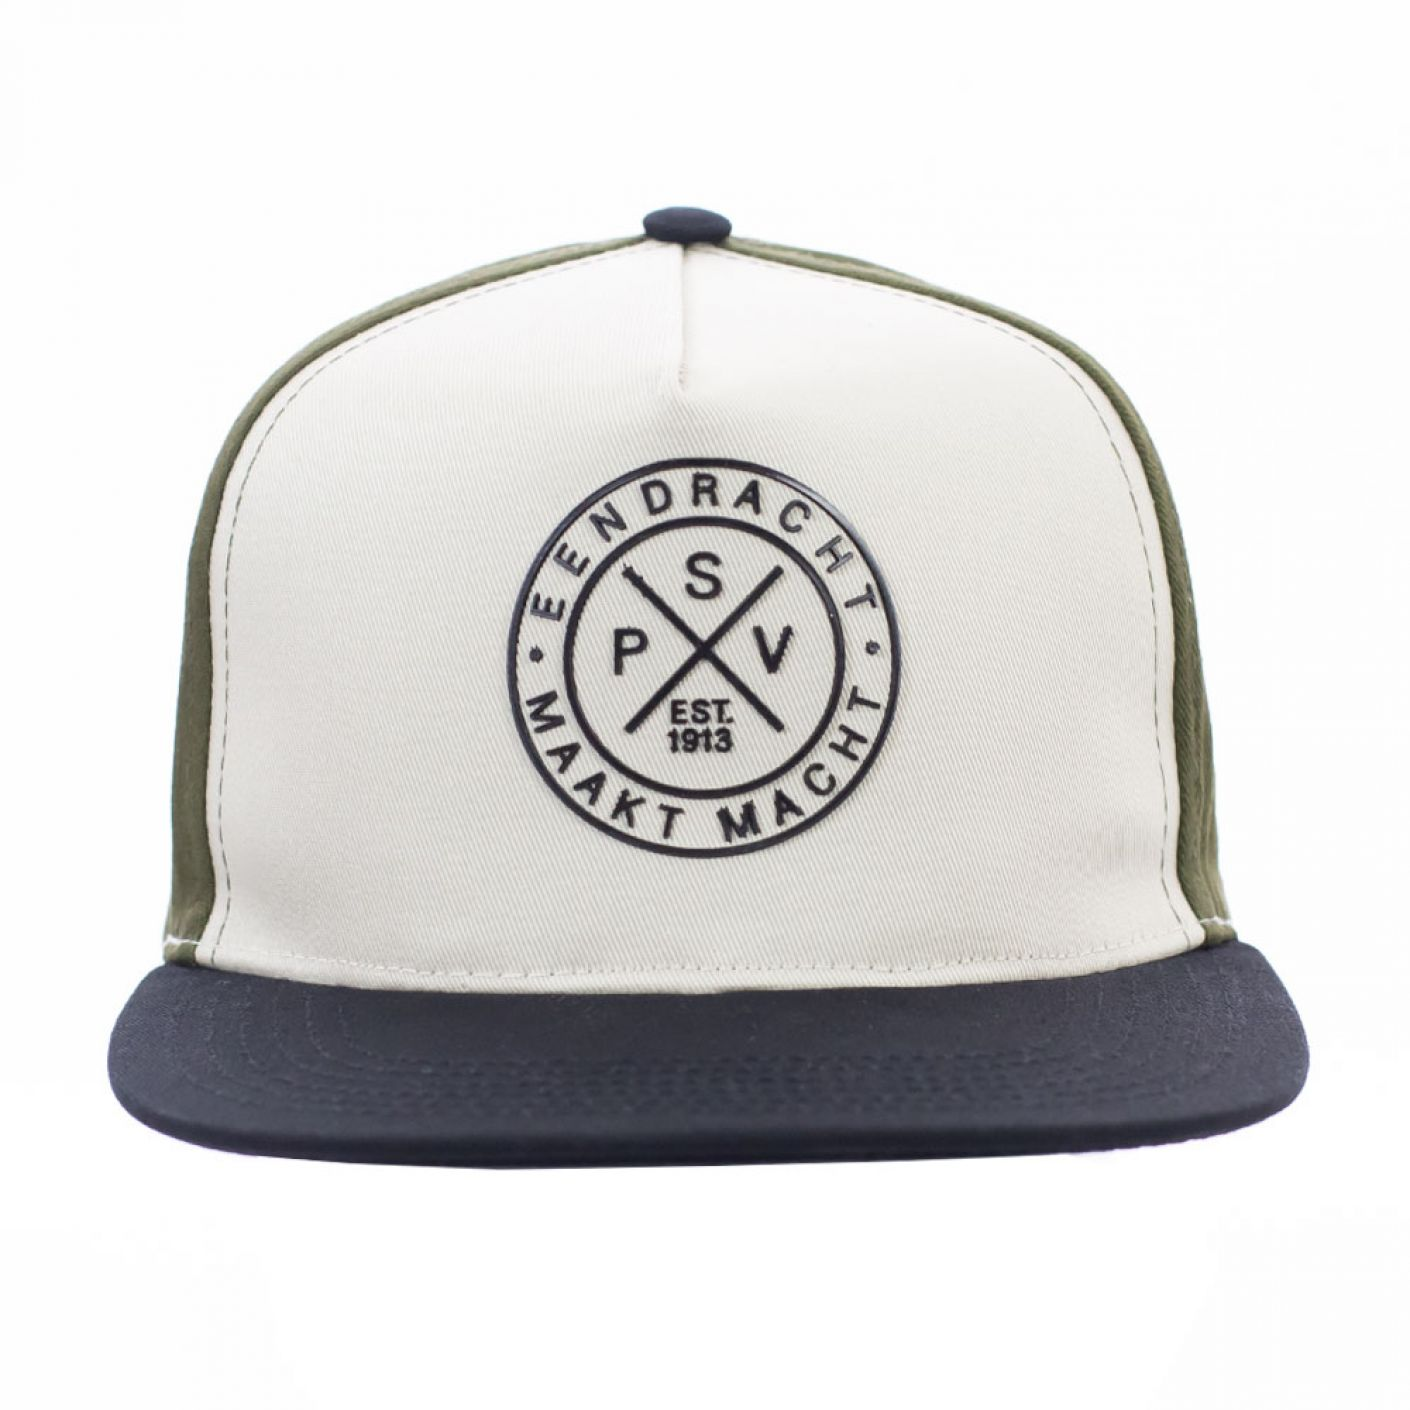 PSV Cap Flatpeak EMM Cross khaki SR